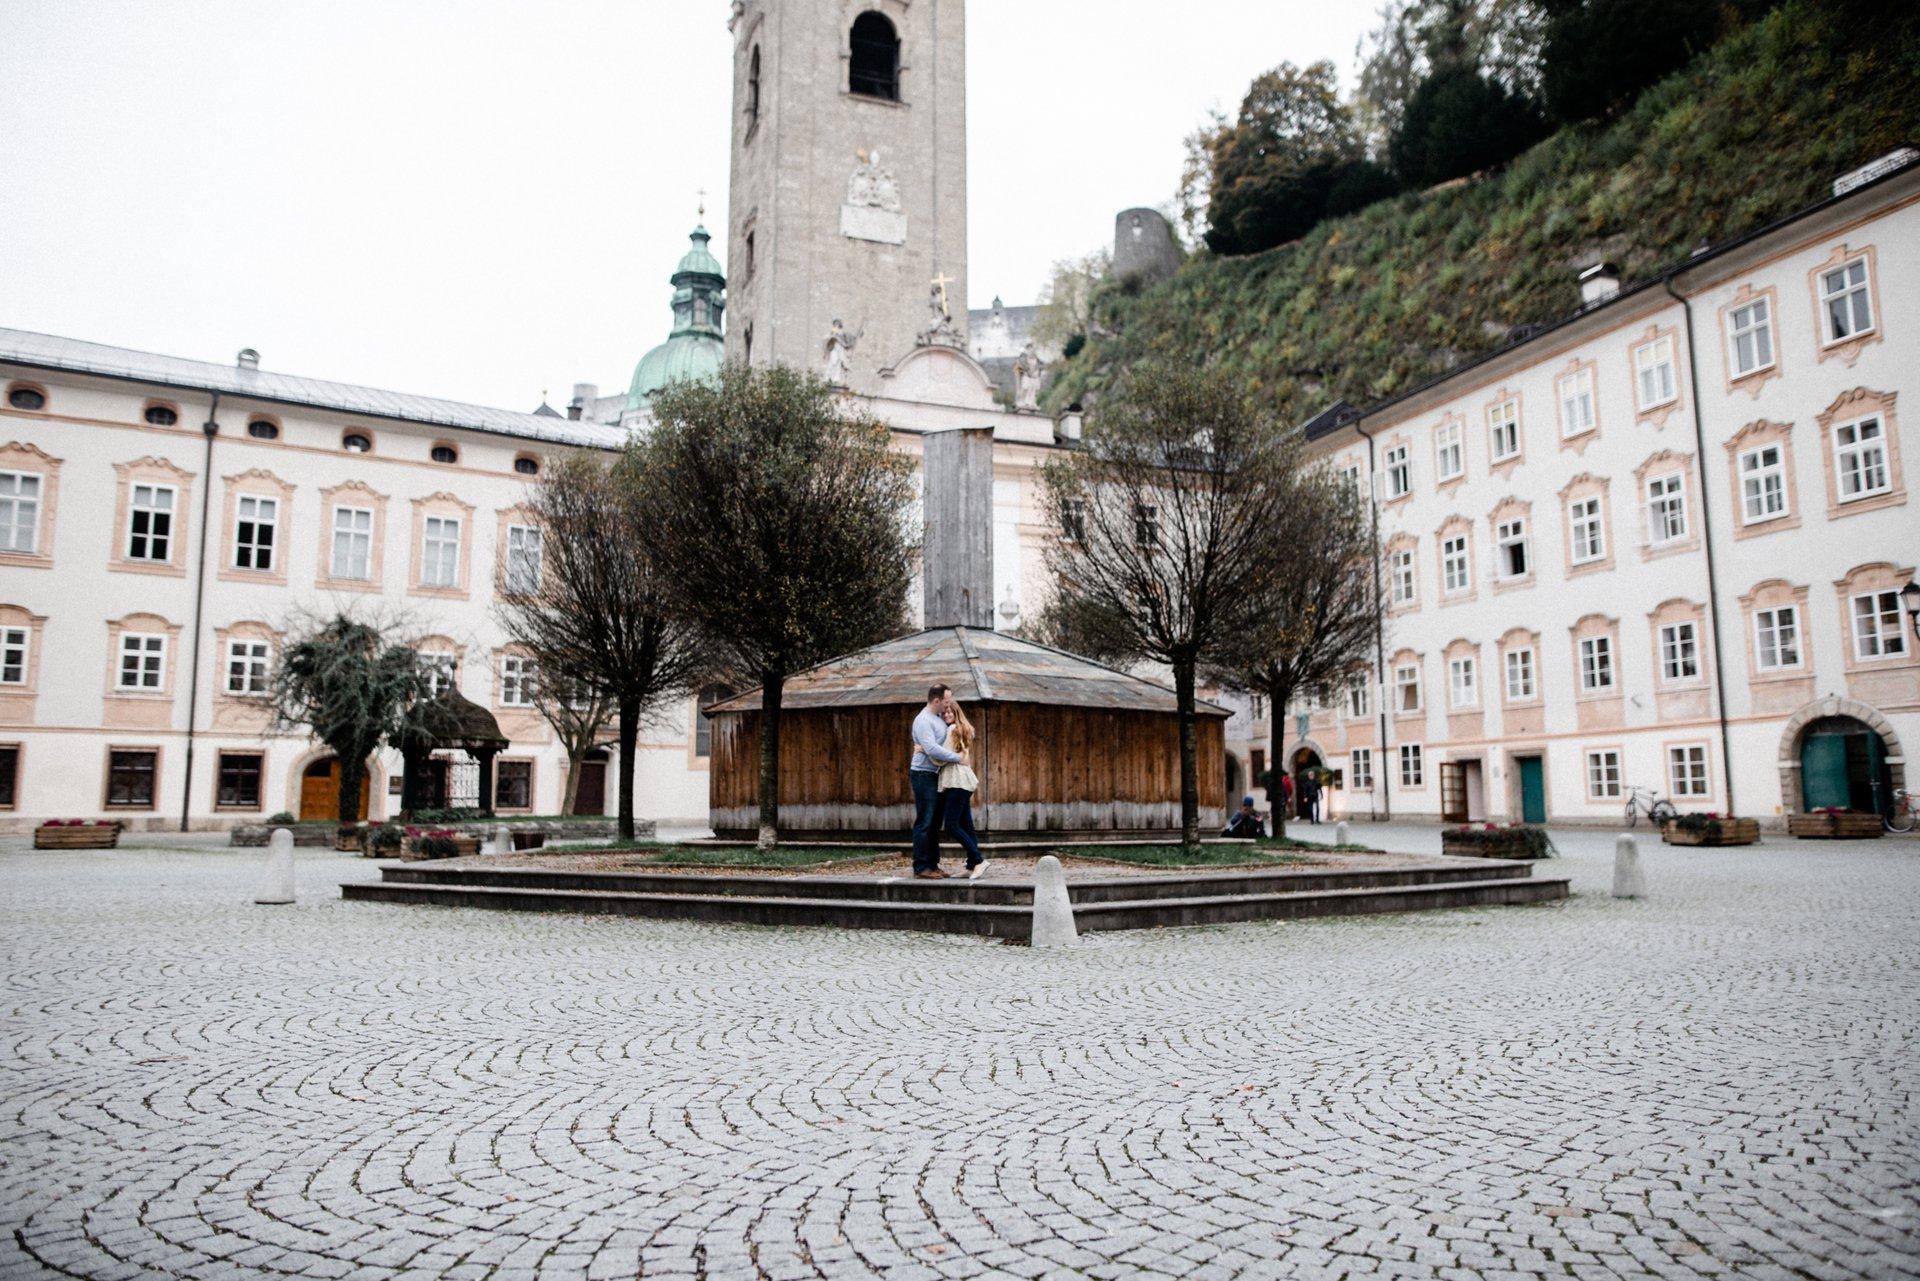 Salzburg-Austria-travel-story-Flytographer-23